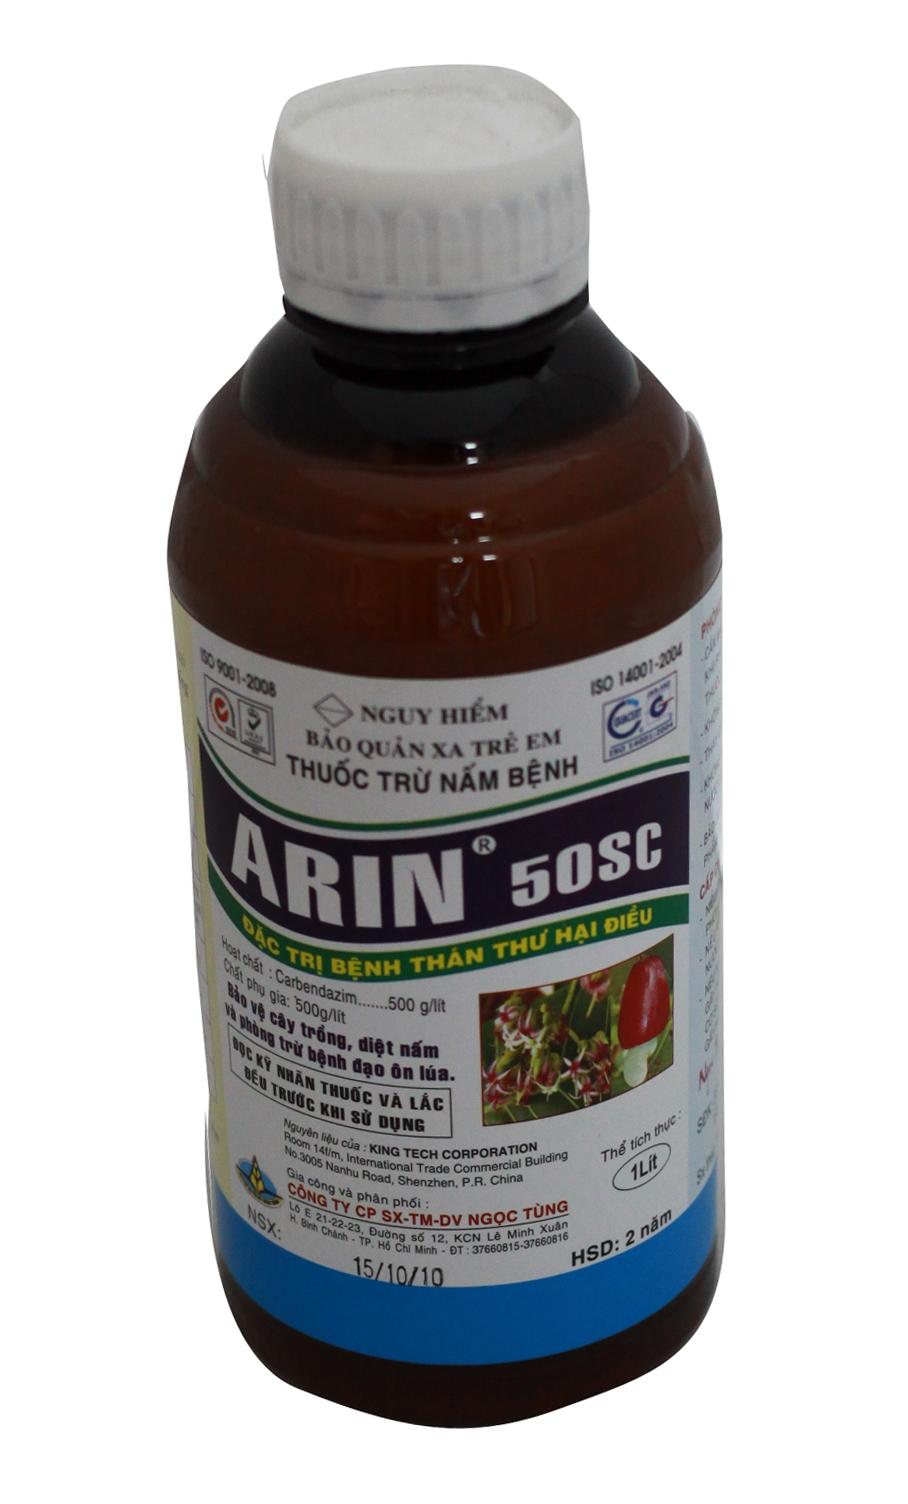 ARIN 50SC 500ml